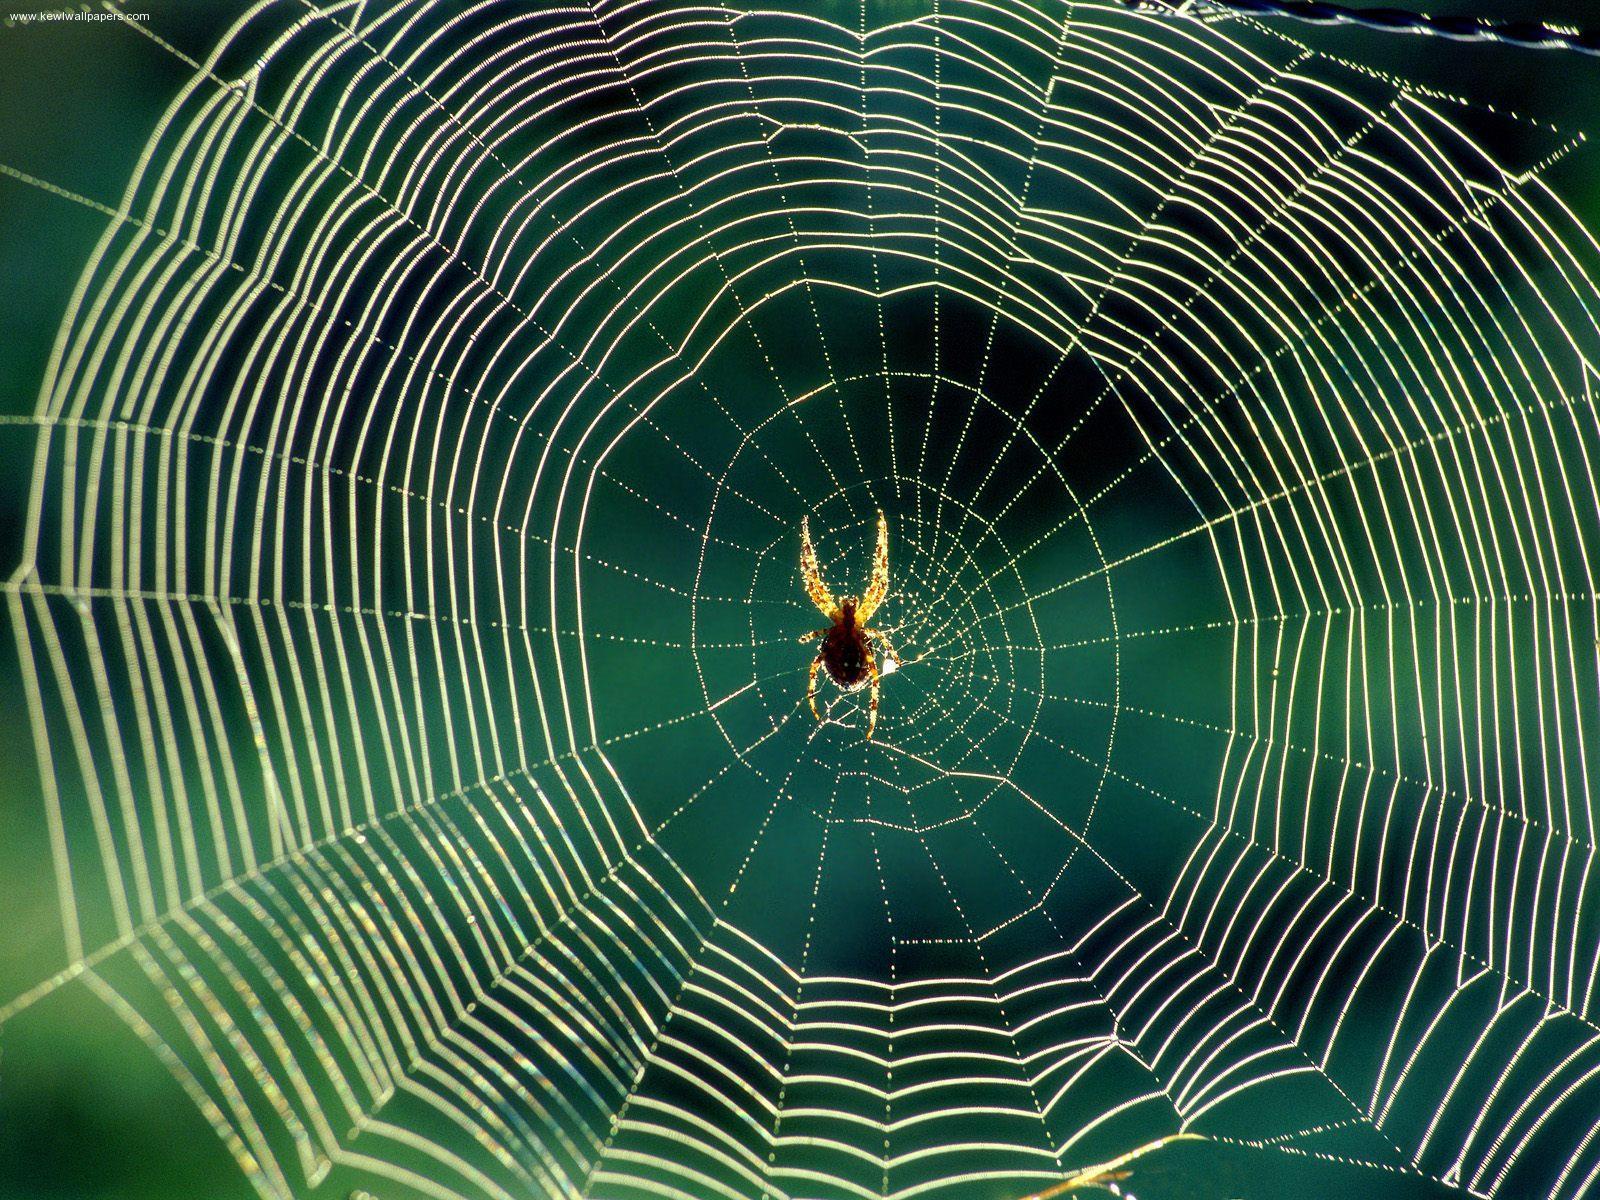 Avoid 'Charlotte's Web' to treat epilepsy